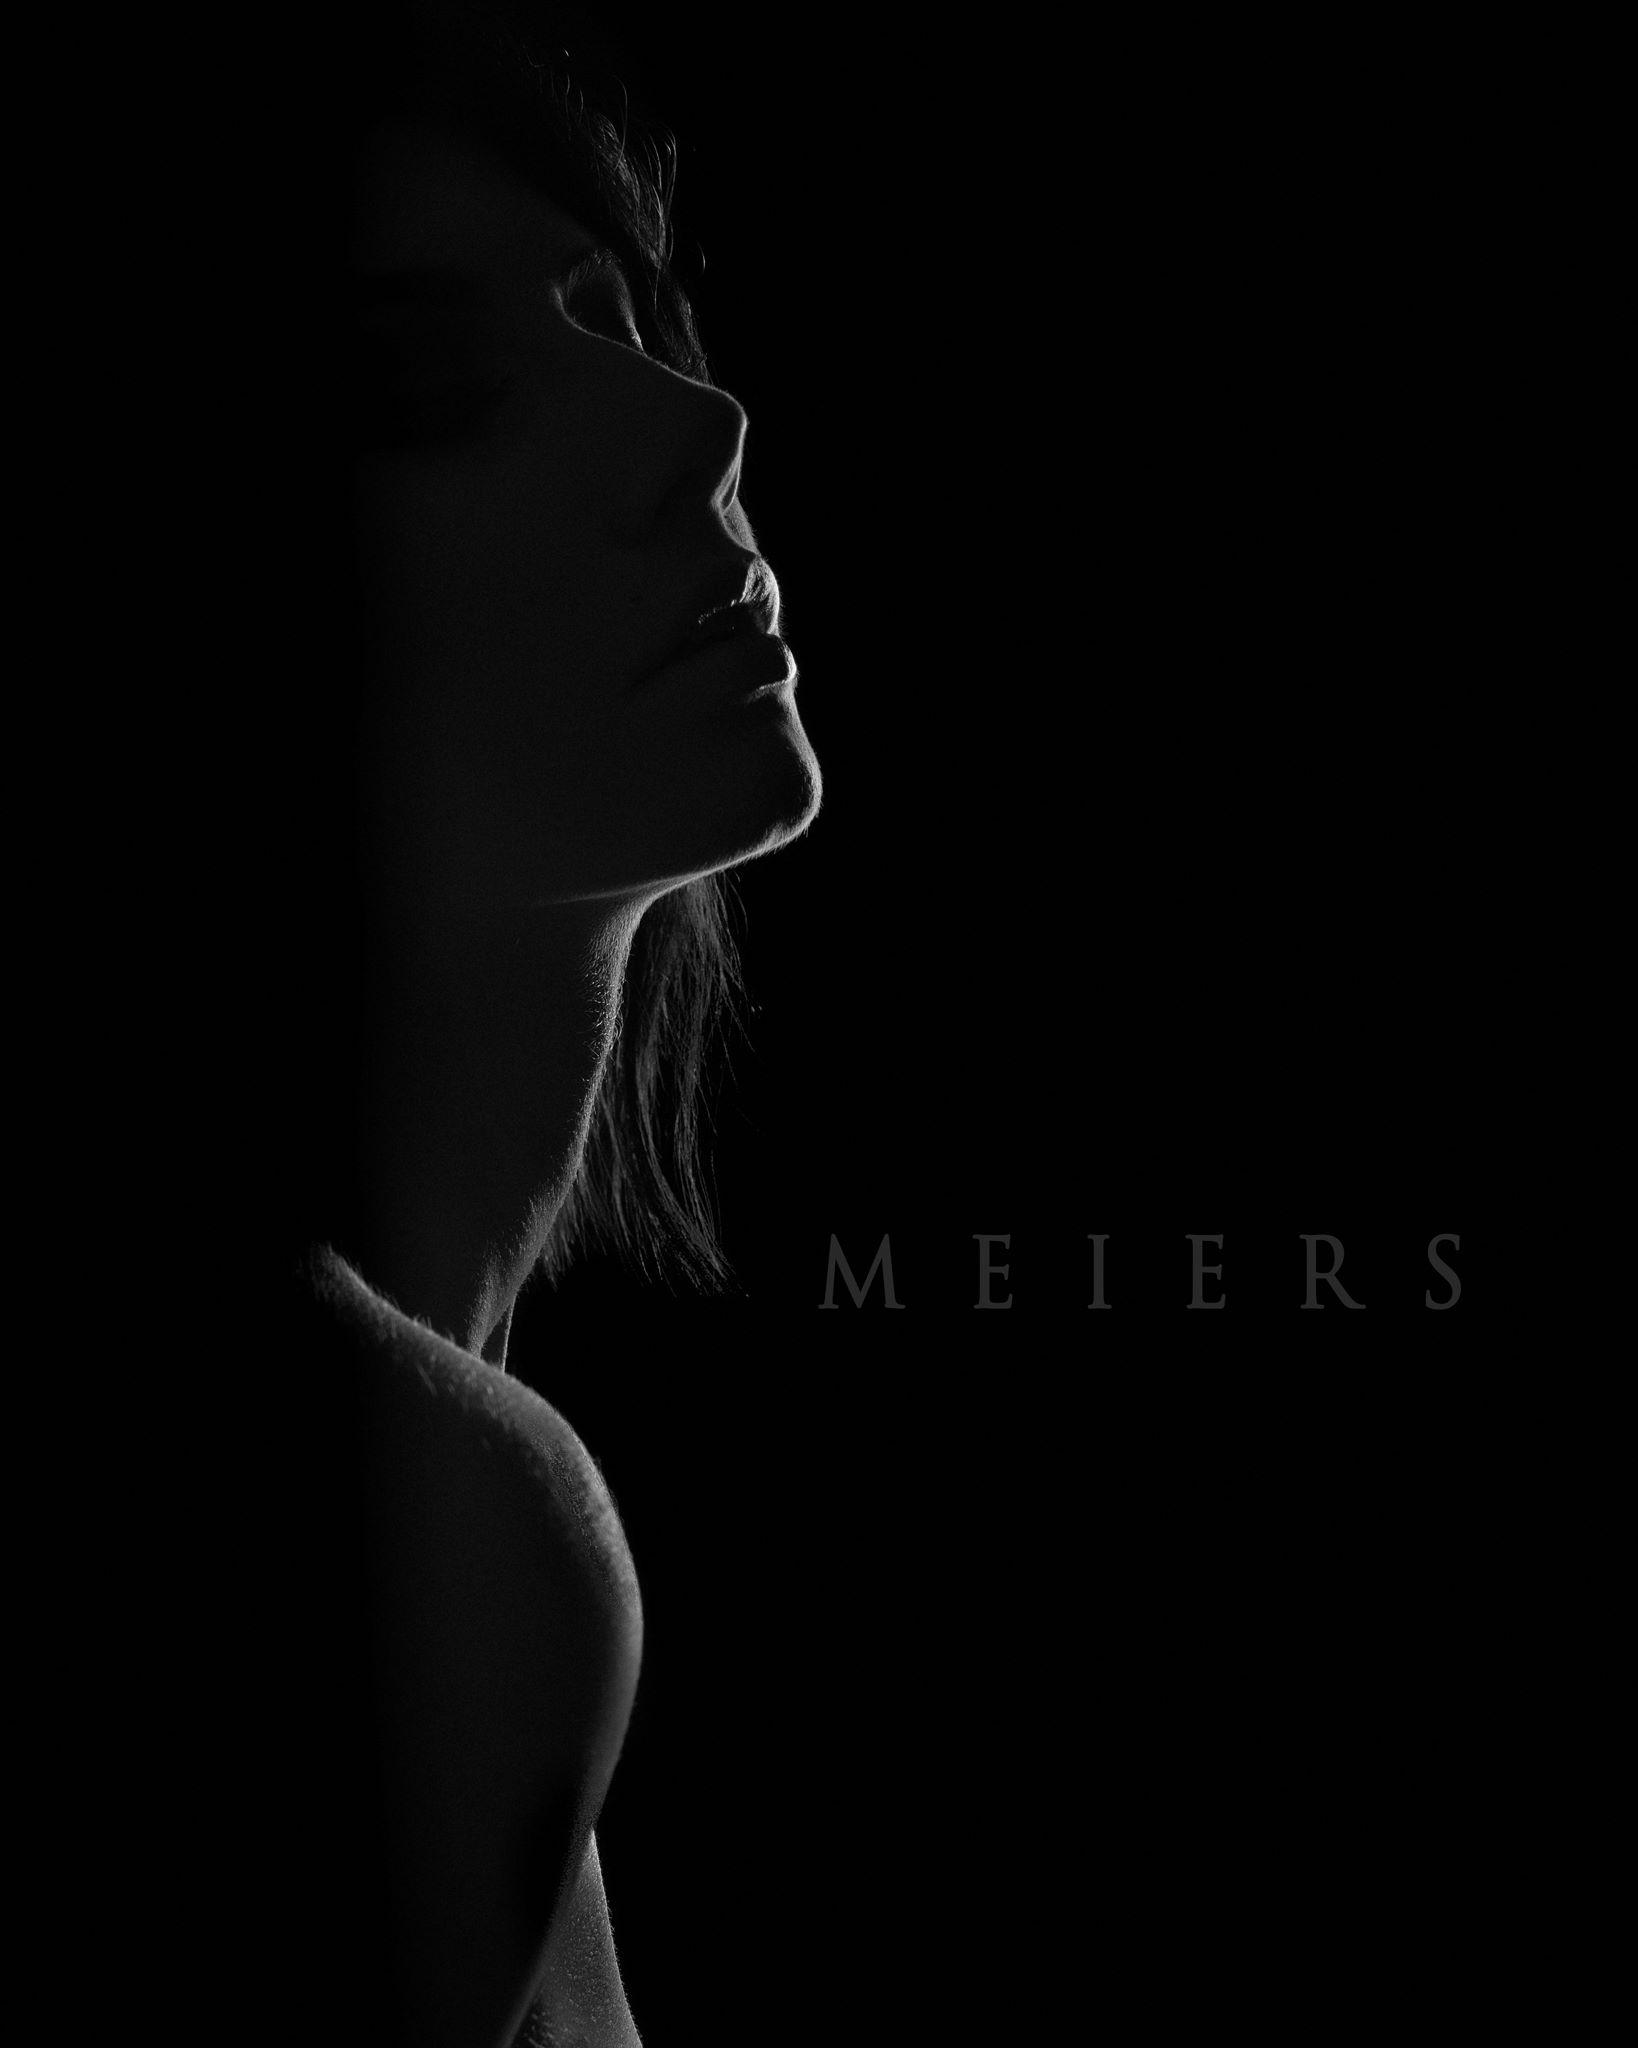 matt-meiers-fine-art-bodyscape-black-and-white-fitness-pittsburgh-photography-photographer-6.jpg